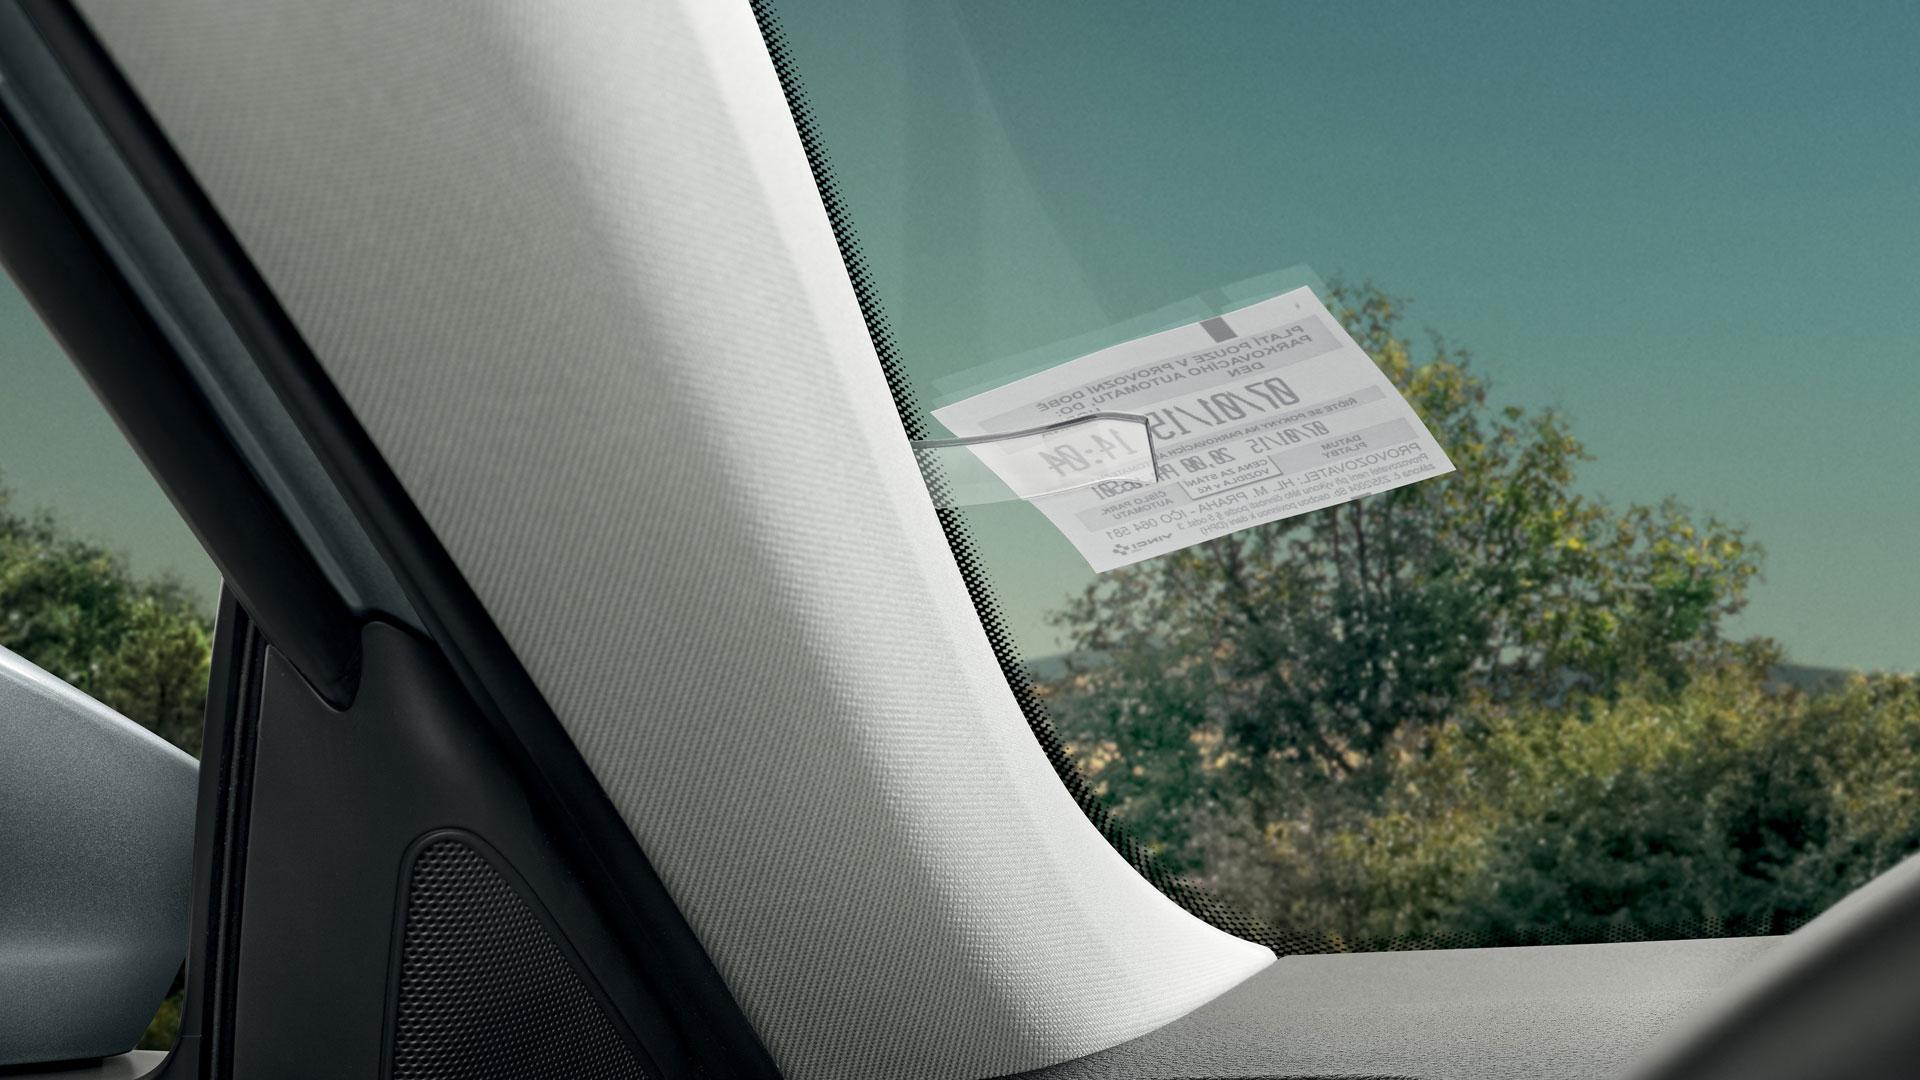 Skoda parking ticket holder